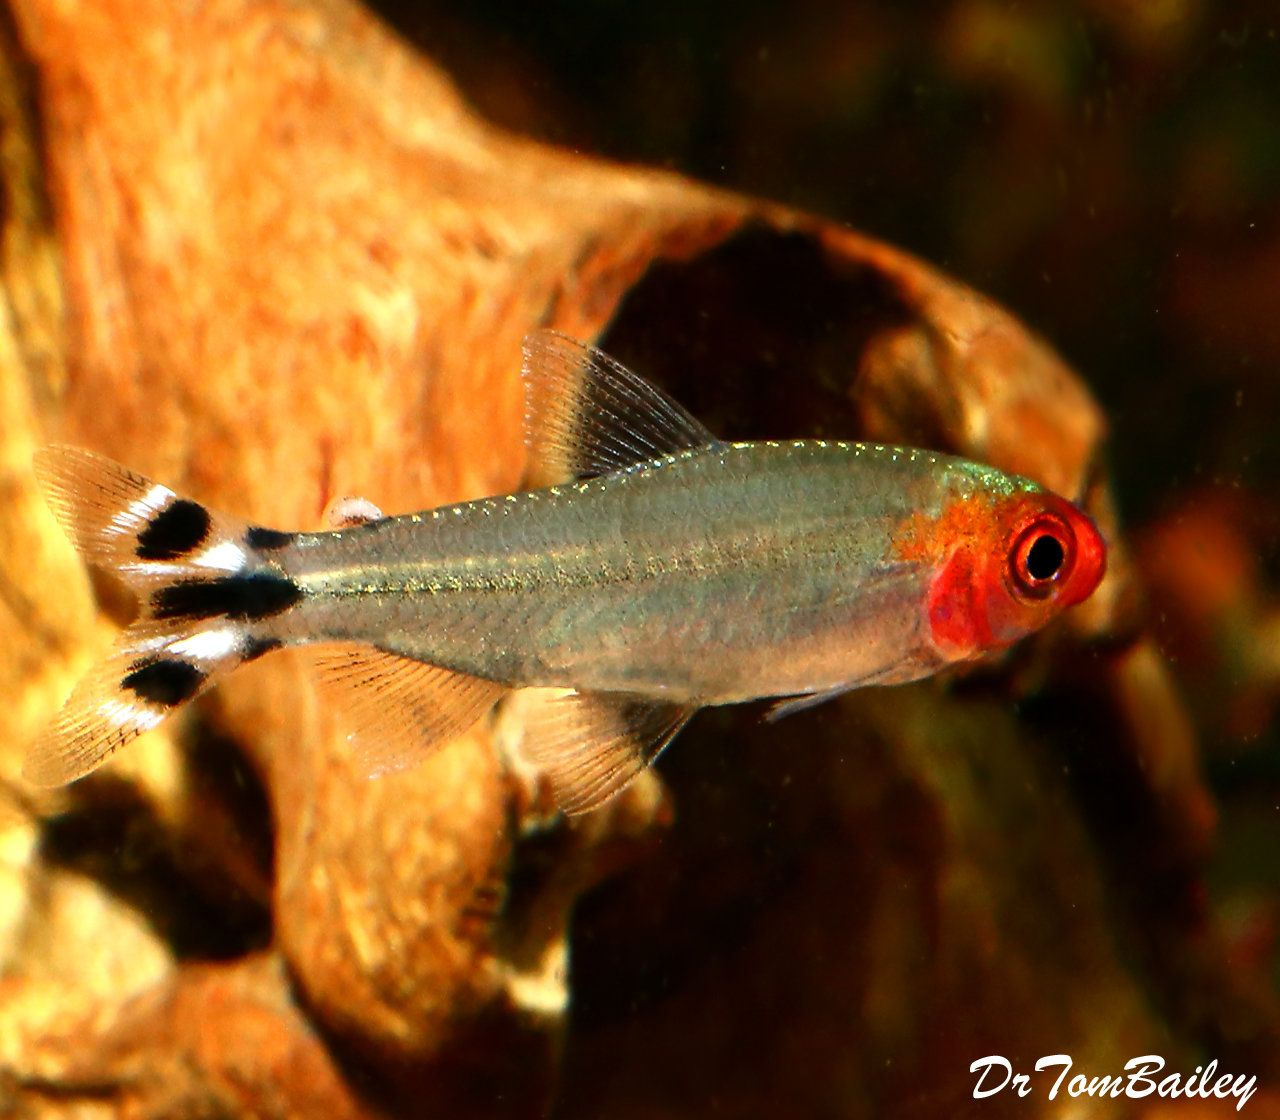 Premium Tank Raised Rummy Nose Tetra 1 To 1 2 Long Tank Raised Fresh Water Fish Tank Aquarium Fish Tropical Fish